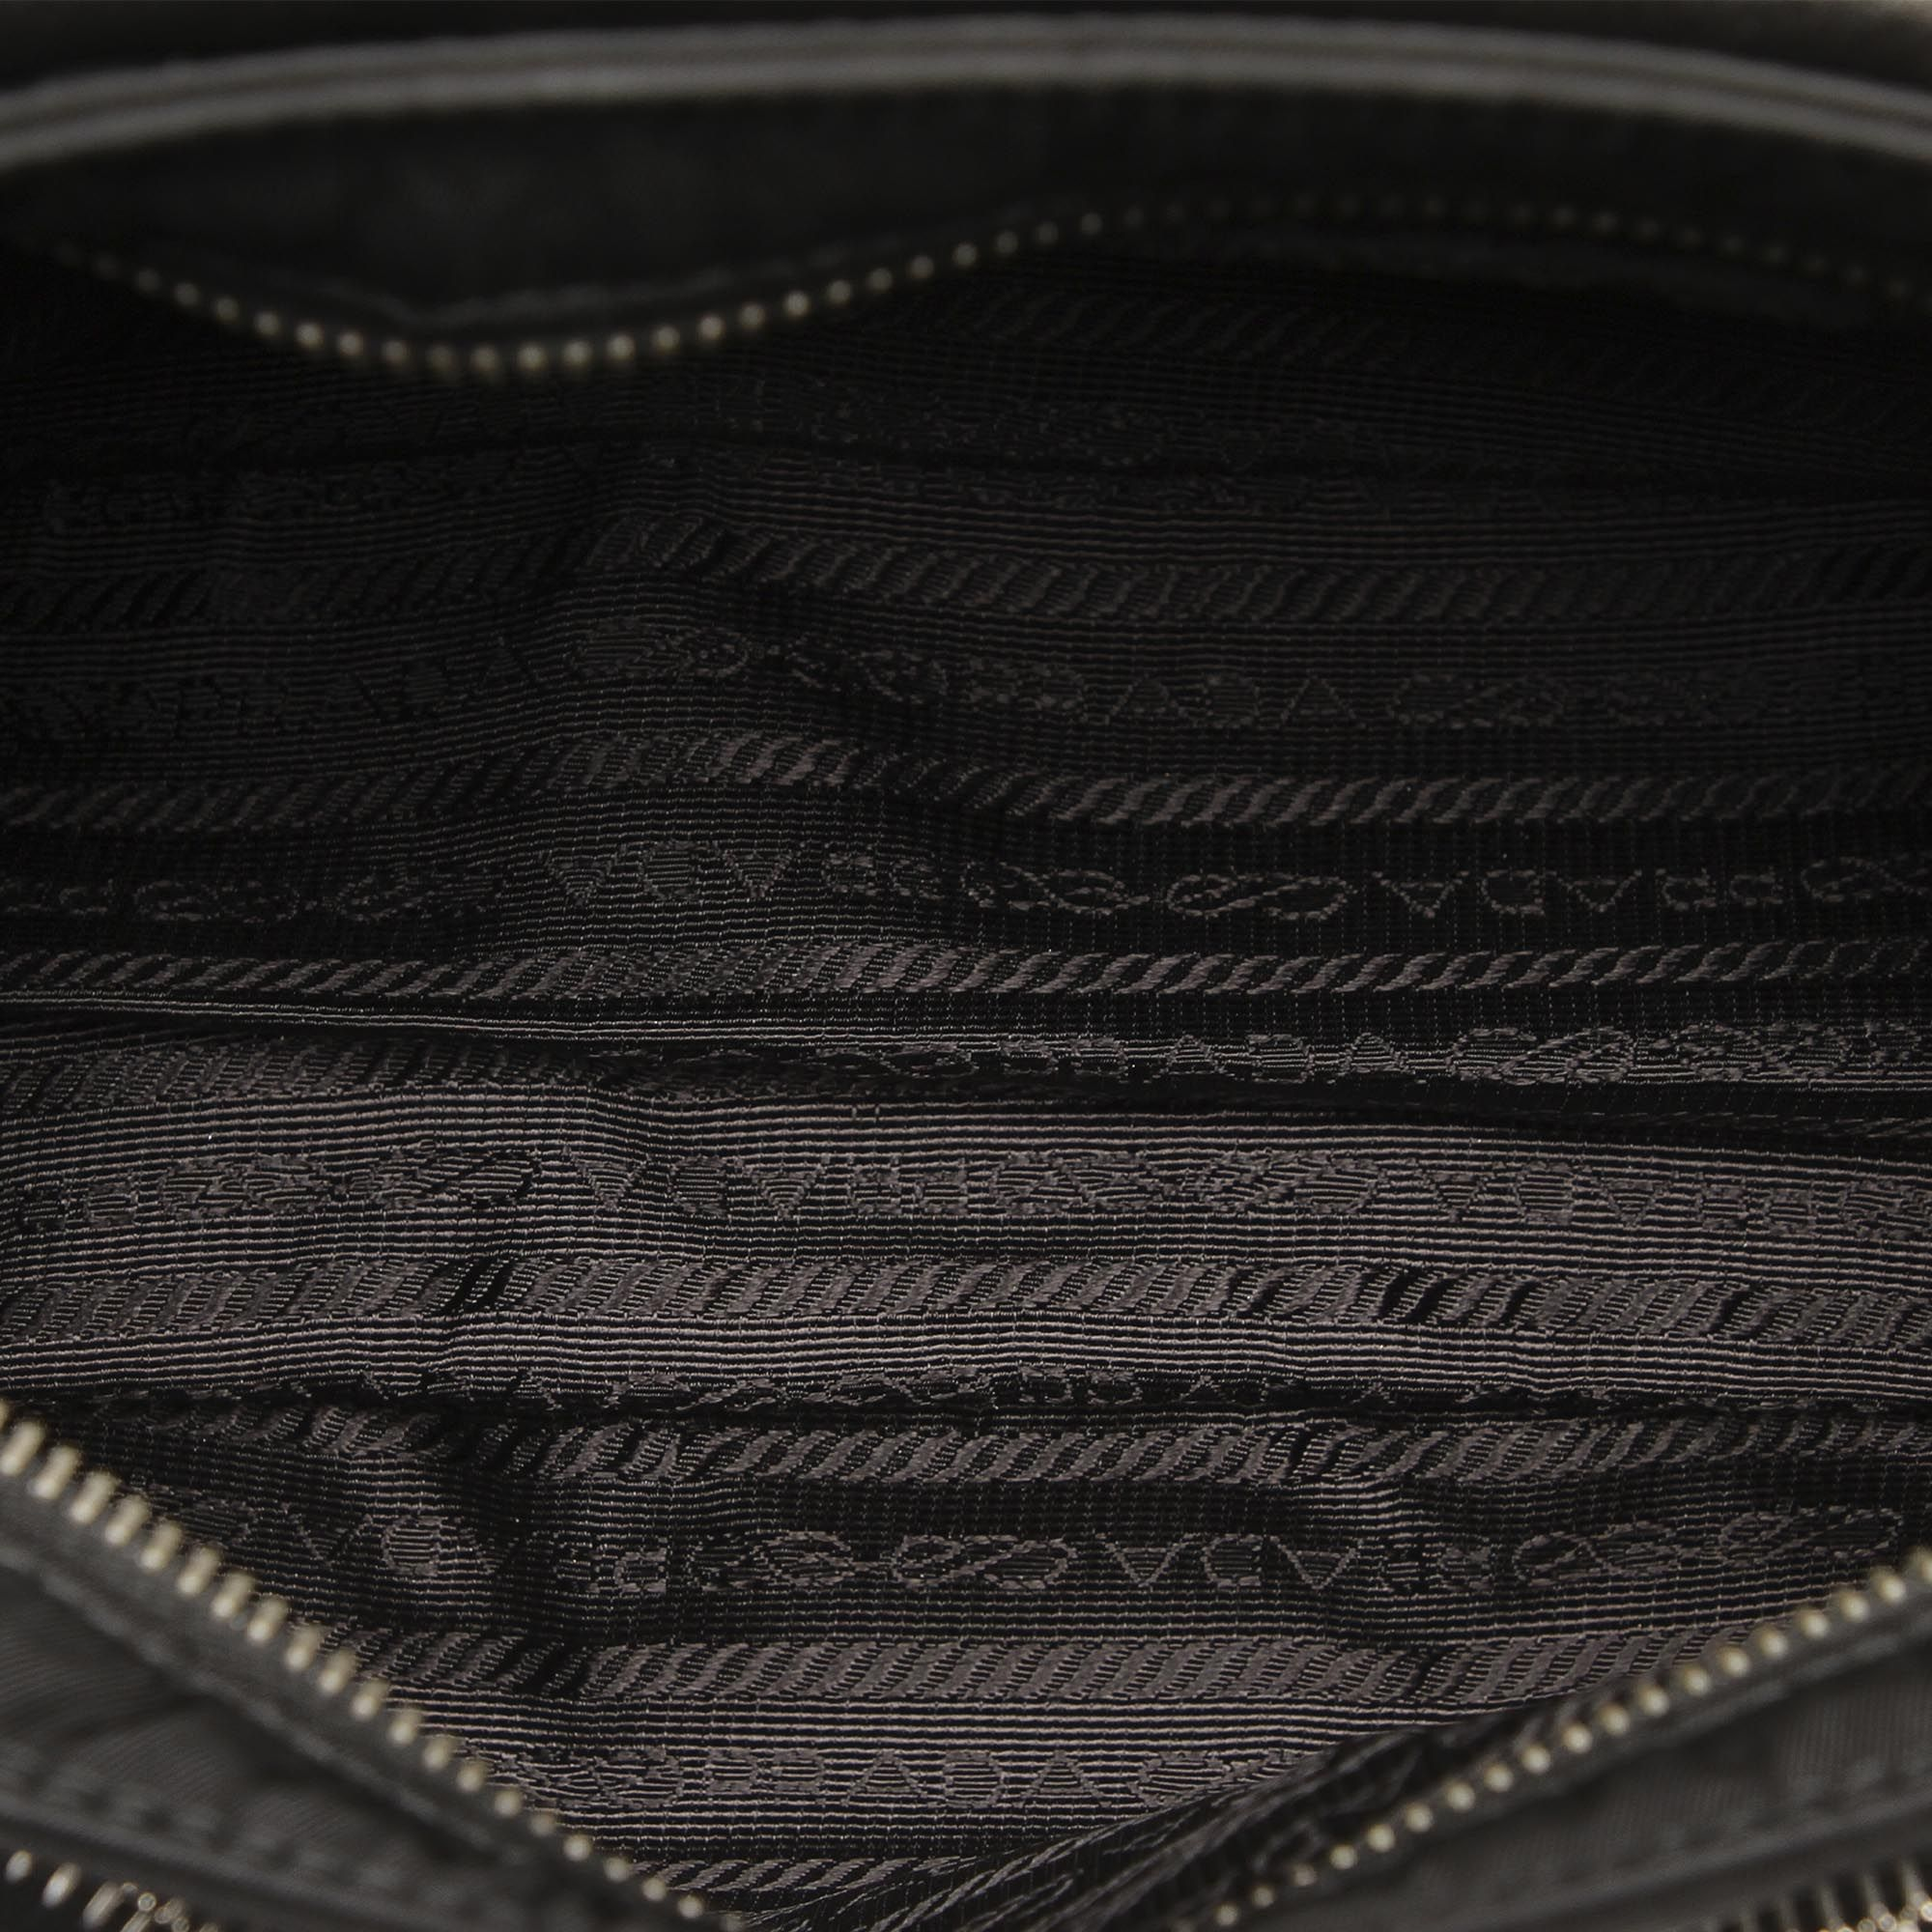 Vintage Prada Tessuto Baguette Black